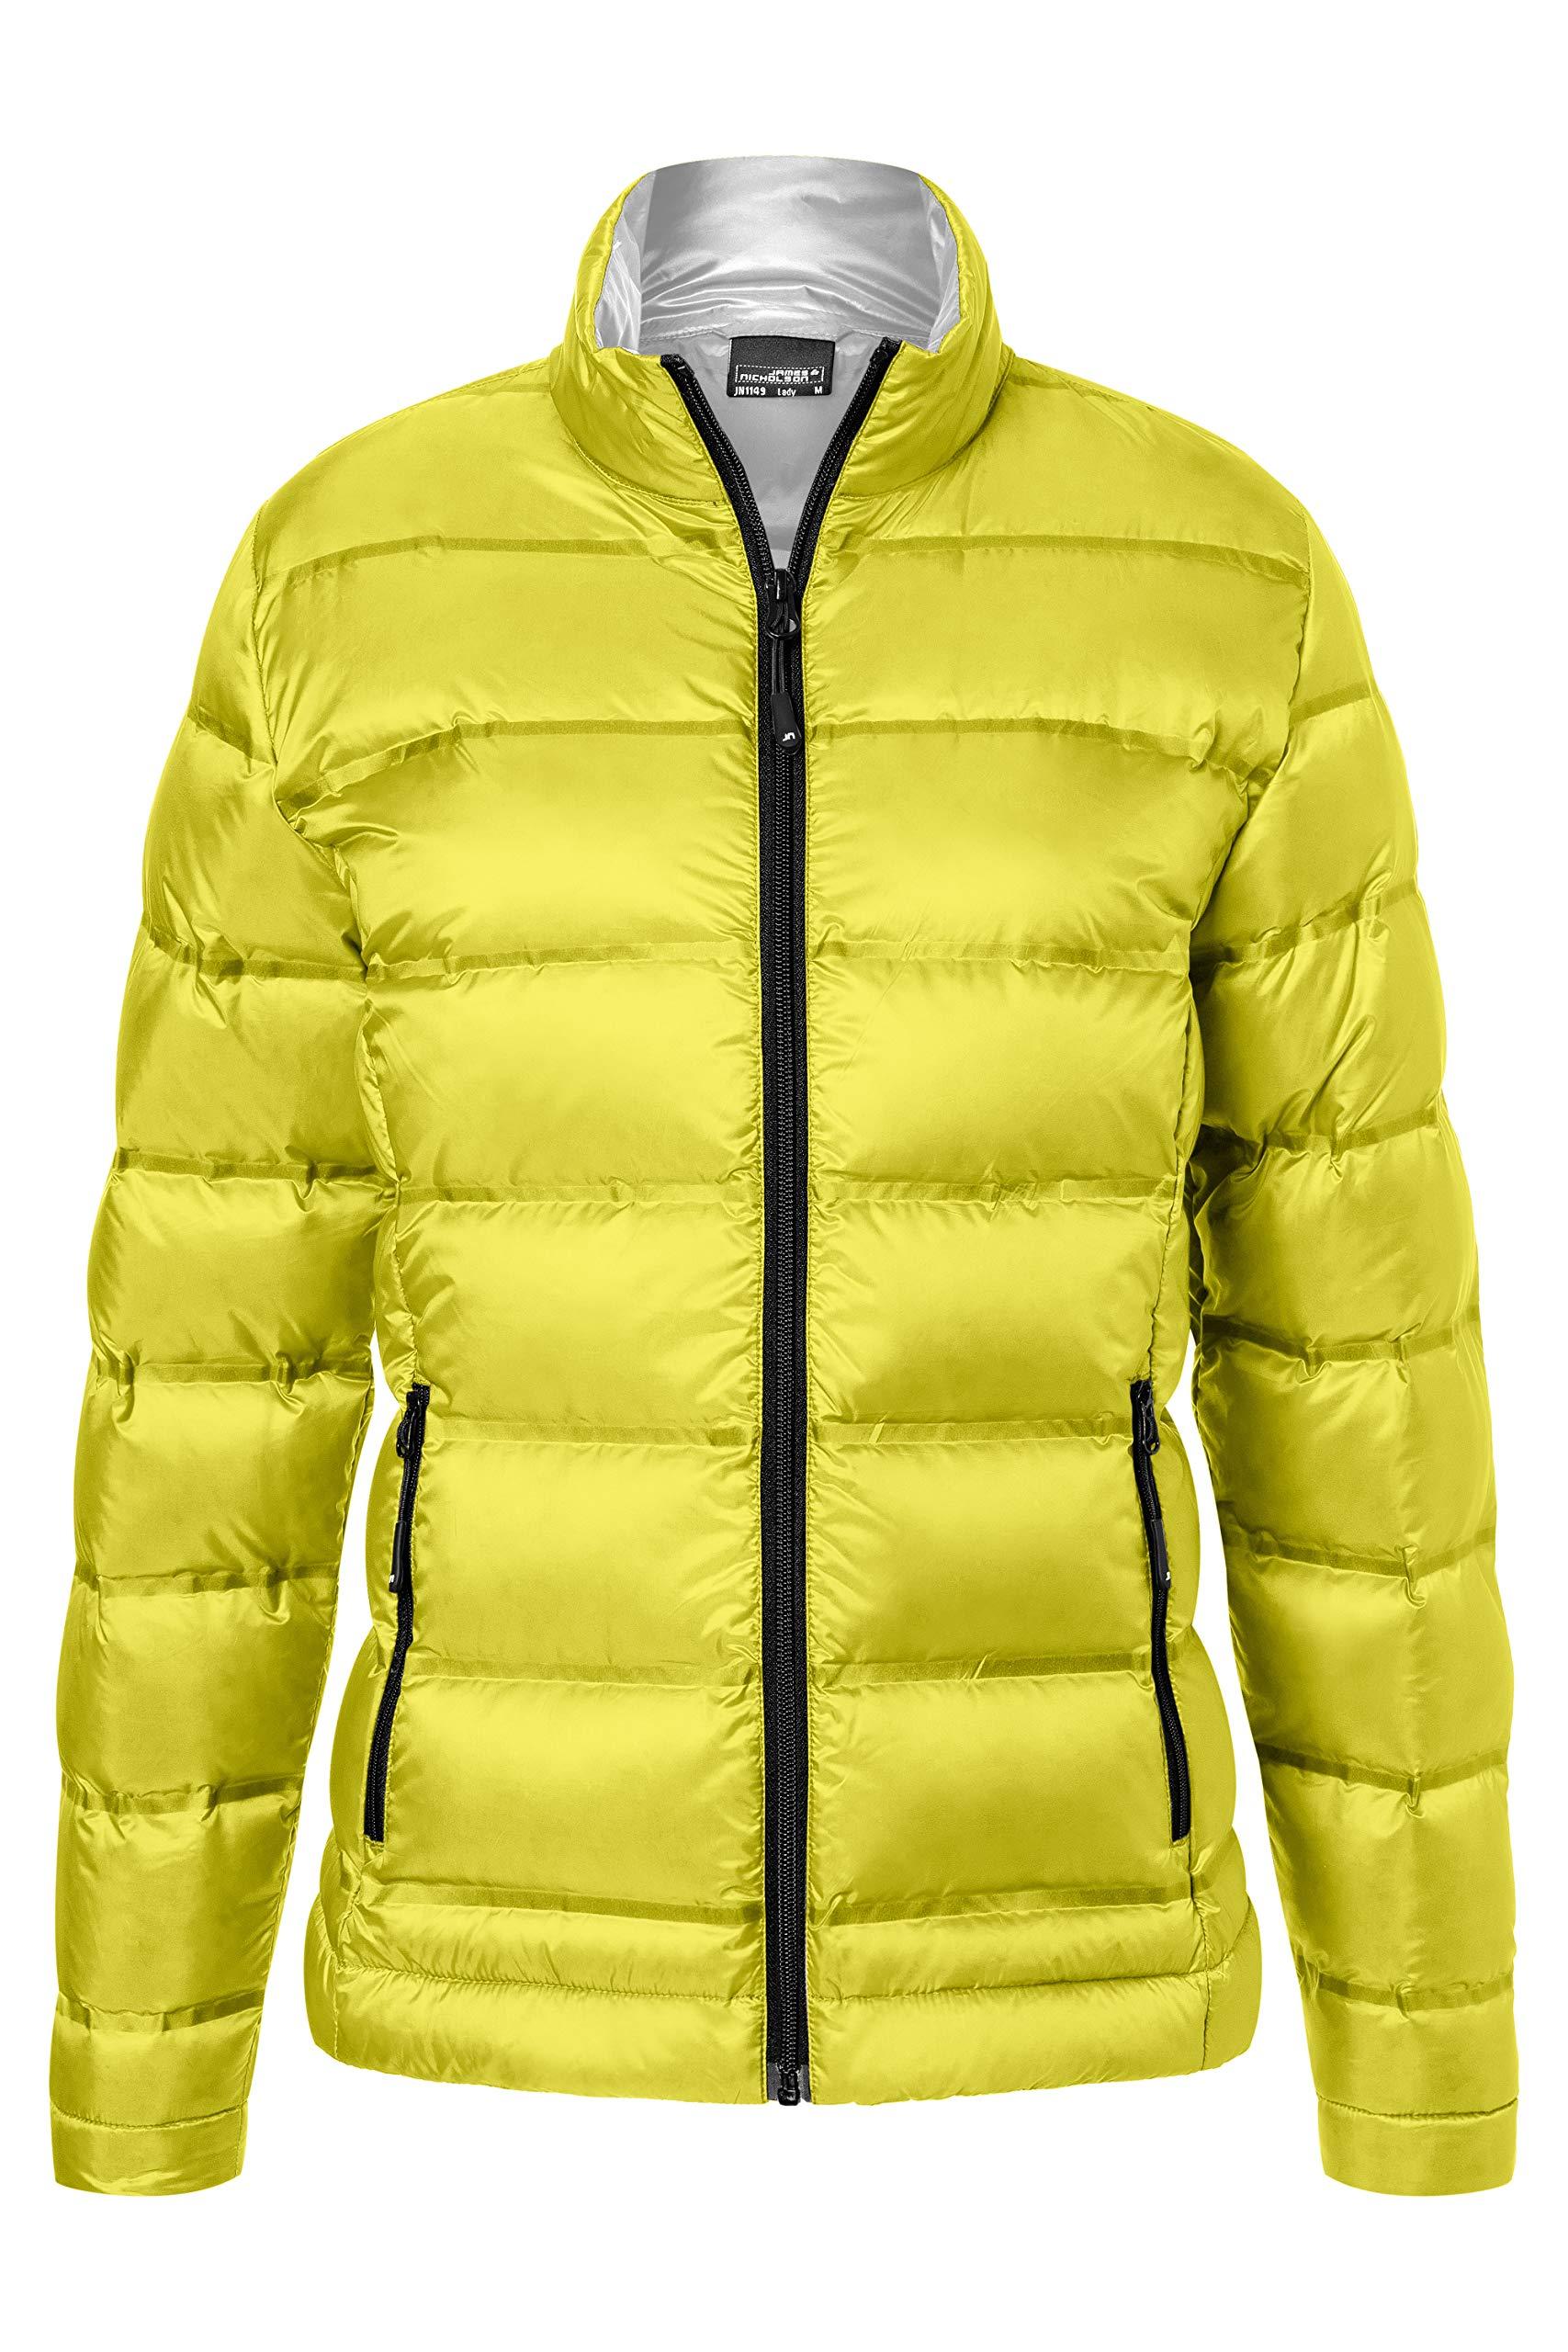 silver44taille largeFemme Jamesamp; Jacket BlousonJaune Nicholson Ladies' Down FabricantXx Yellow b76yfg